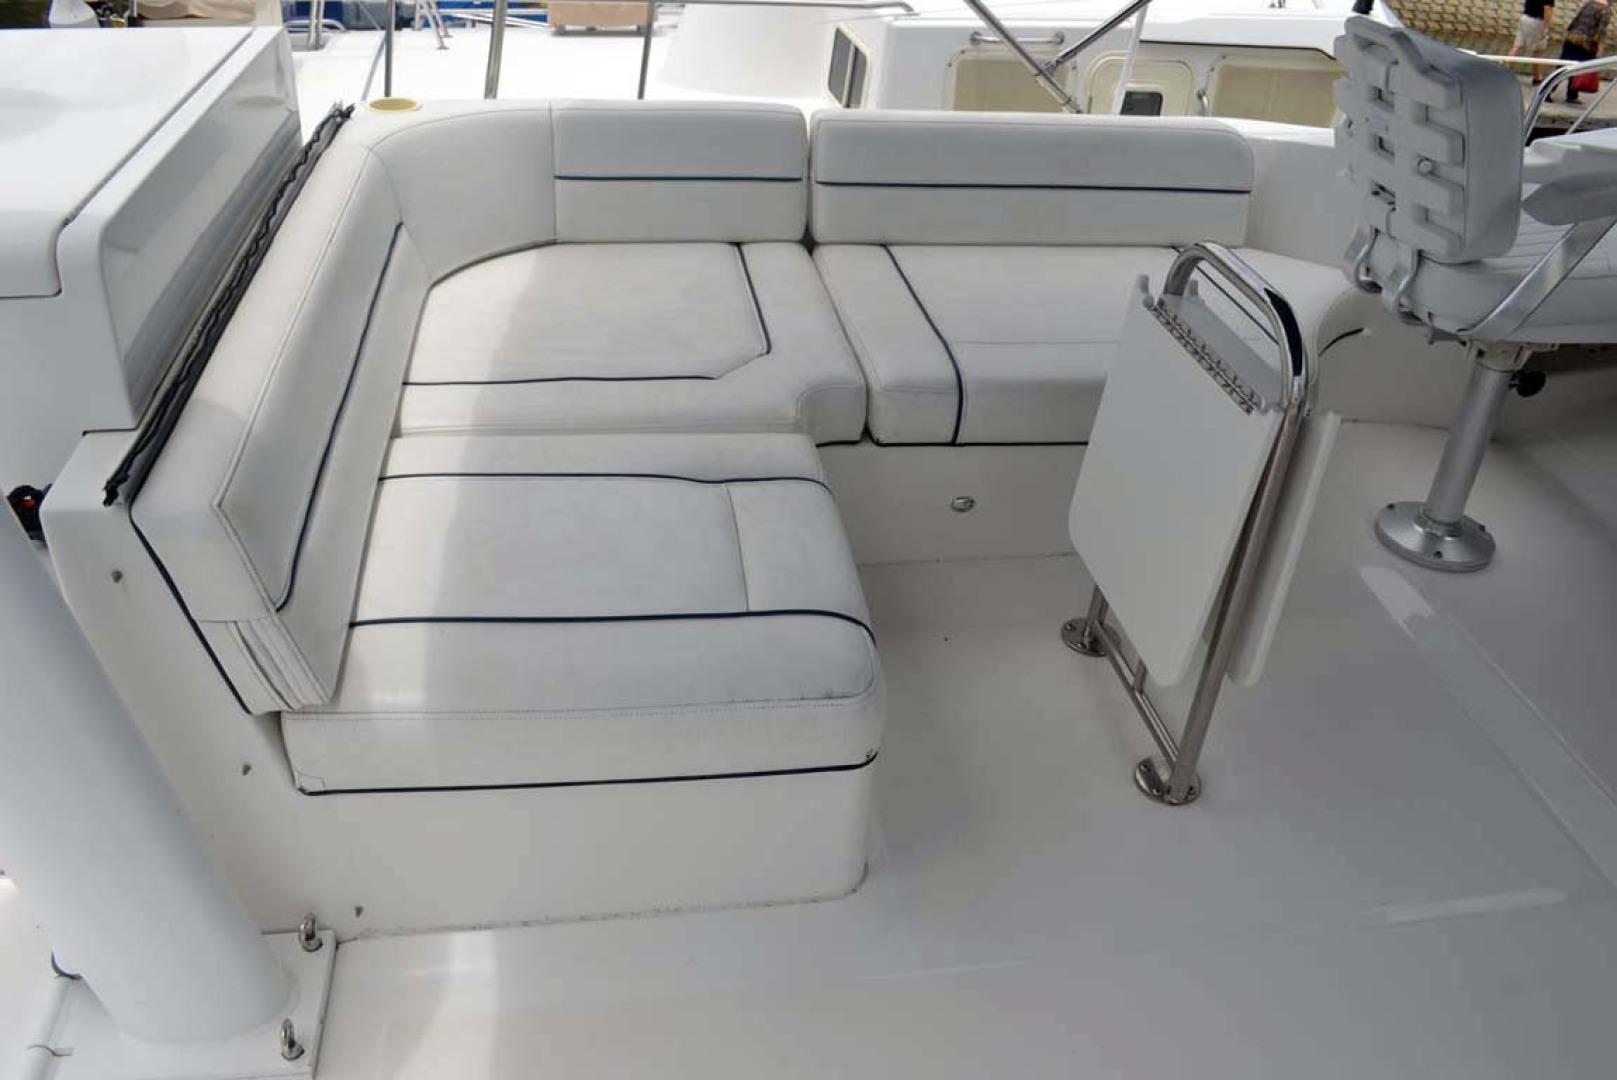 Mainship-395 Trawler 2010-Stargazer Daytona Beach-Florida-United States-Flybridge Seating-1167101 | Thumbnail